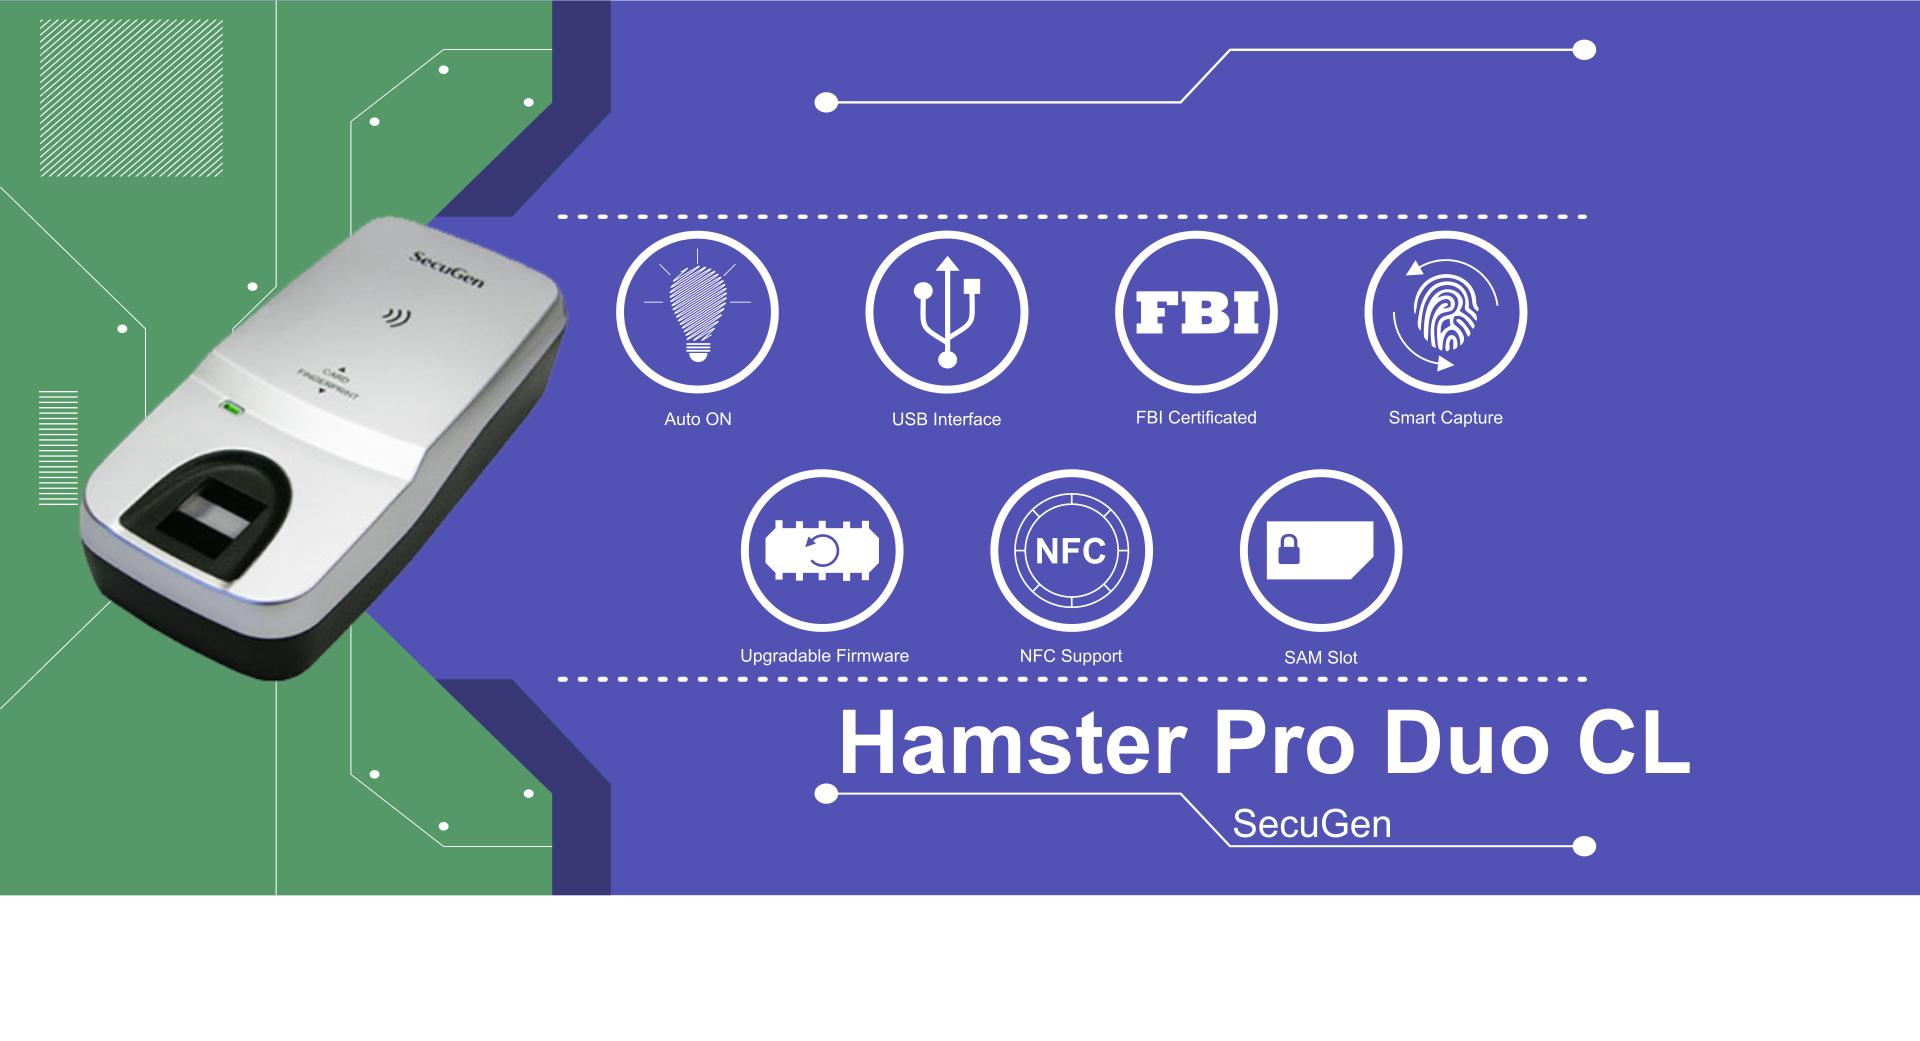 Hamster Pro 2 CL